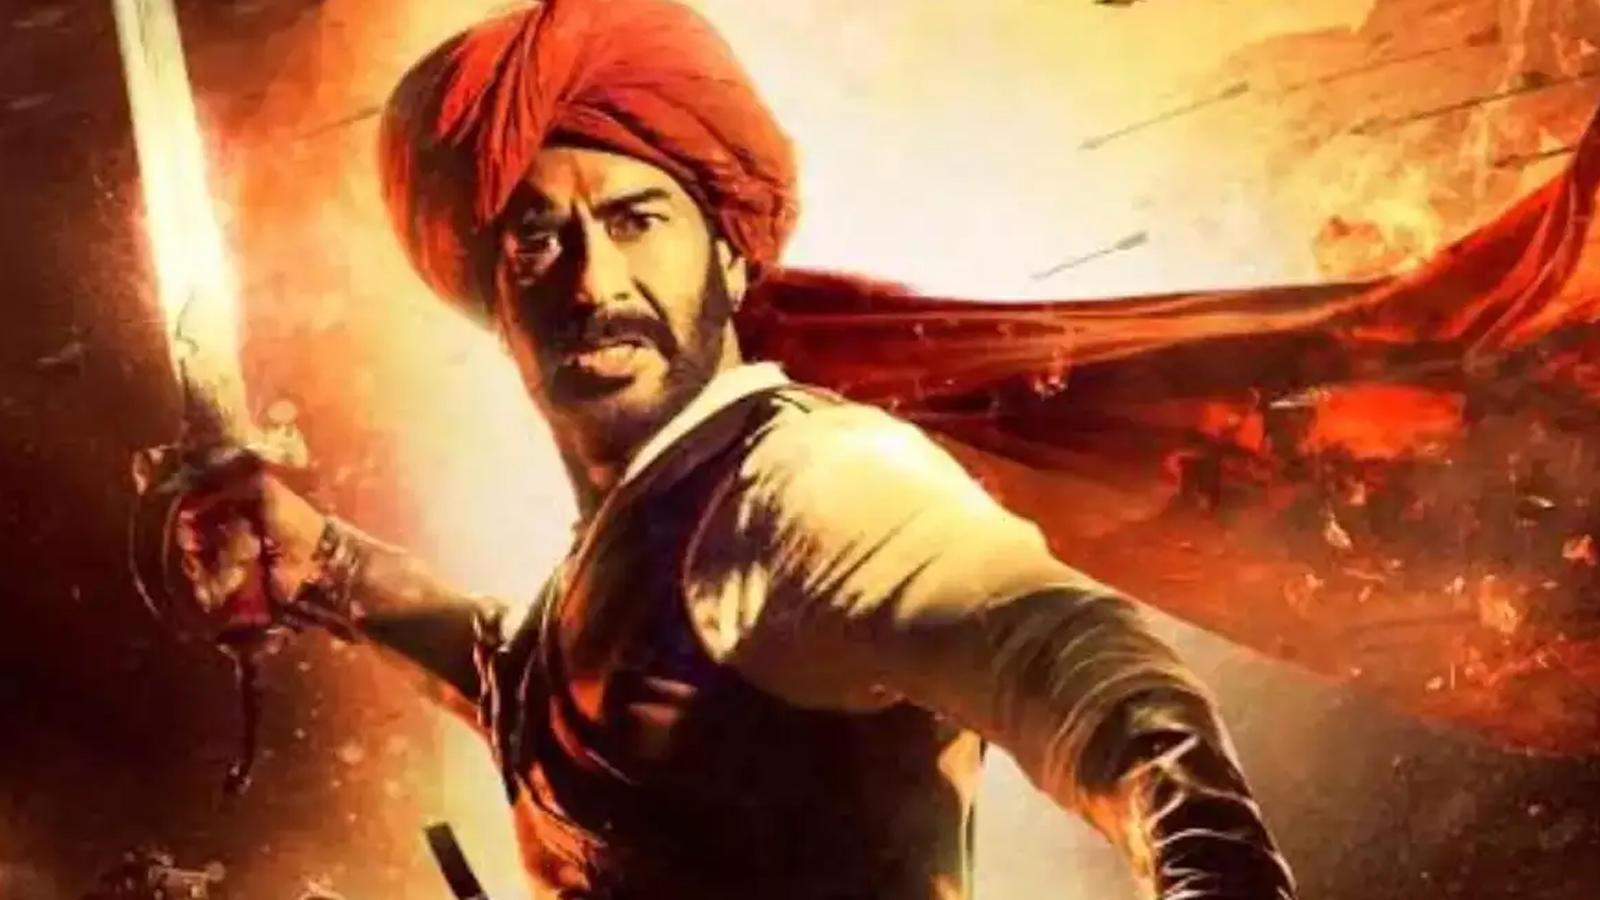 'Tanhaji: The Unsung Warrior': Ajay Devgn starrer declared tax-free in Haryana